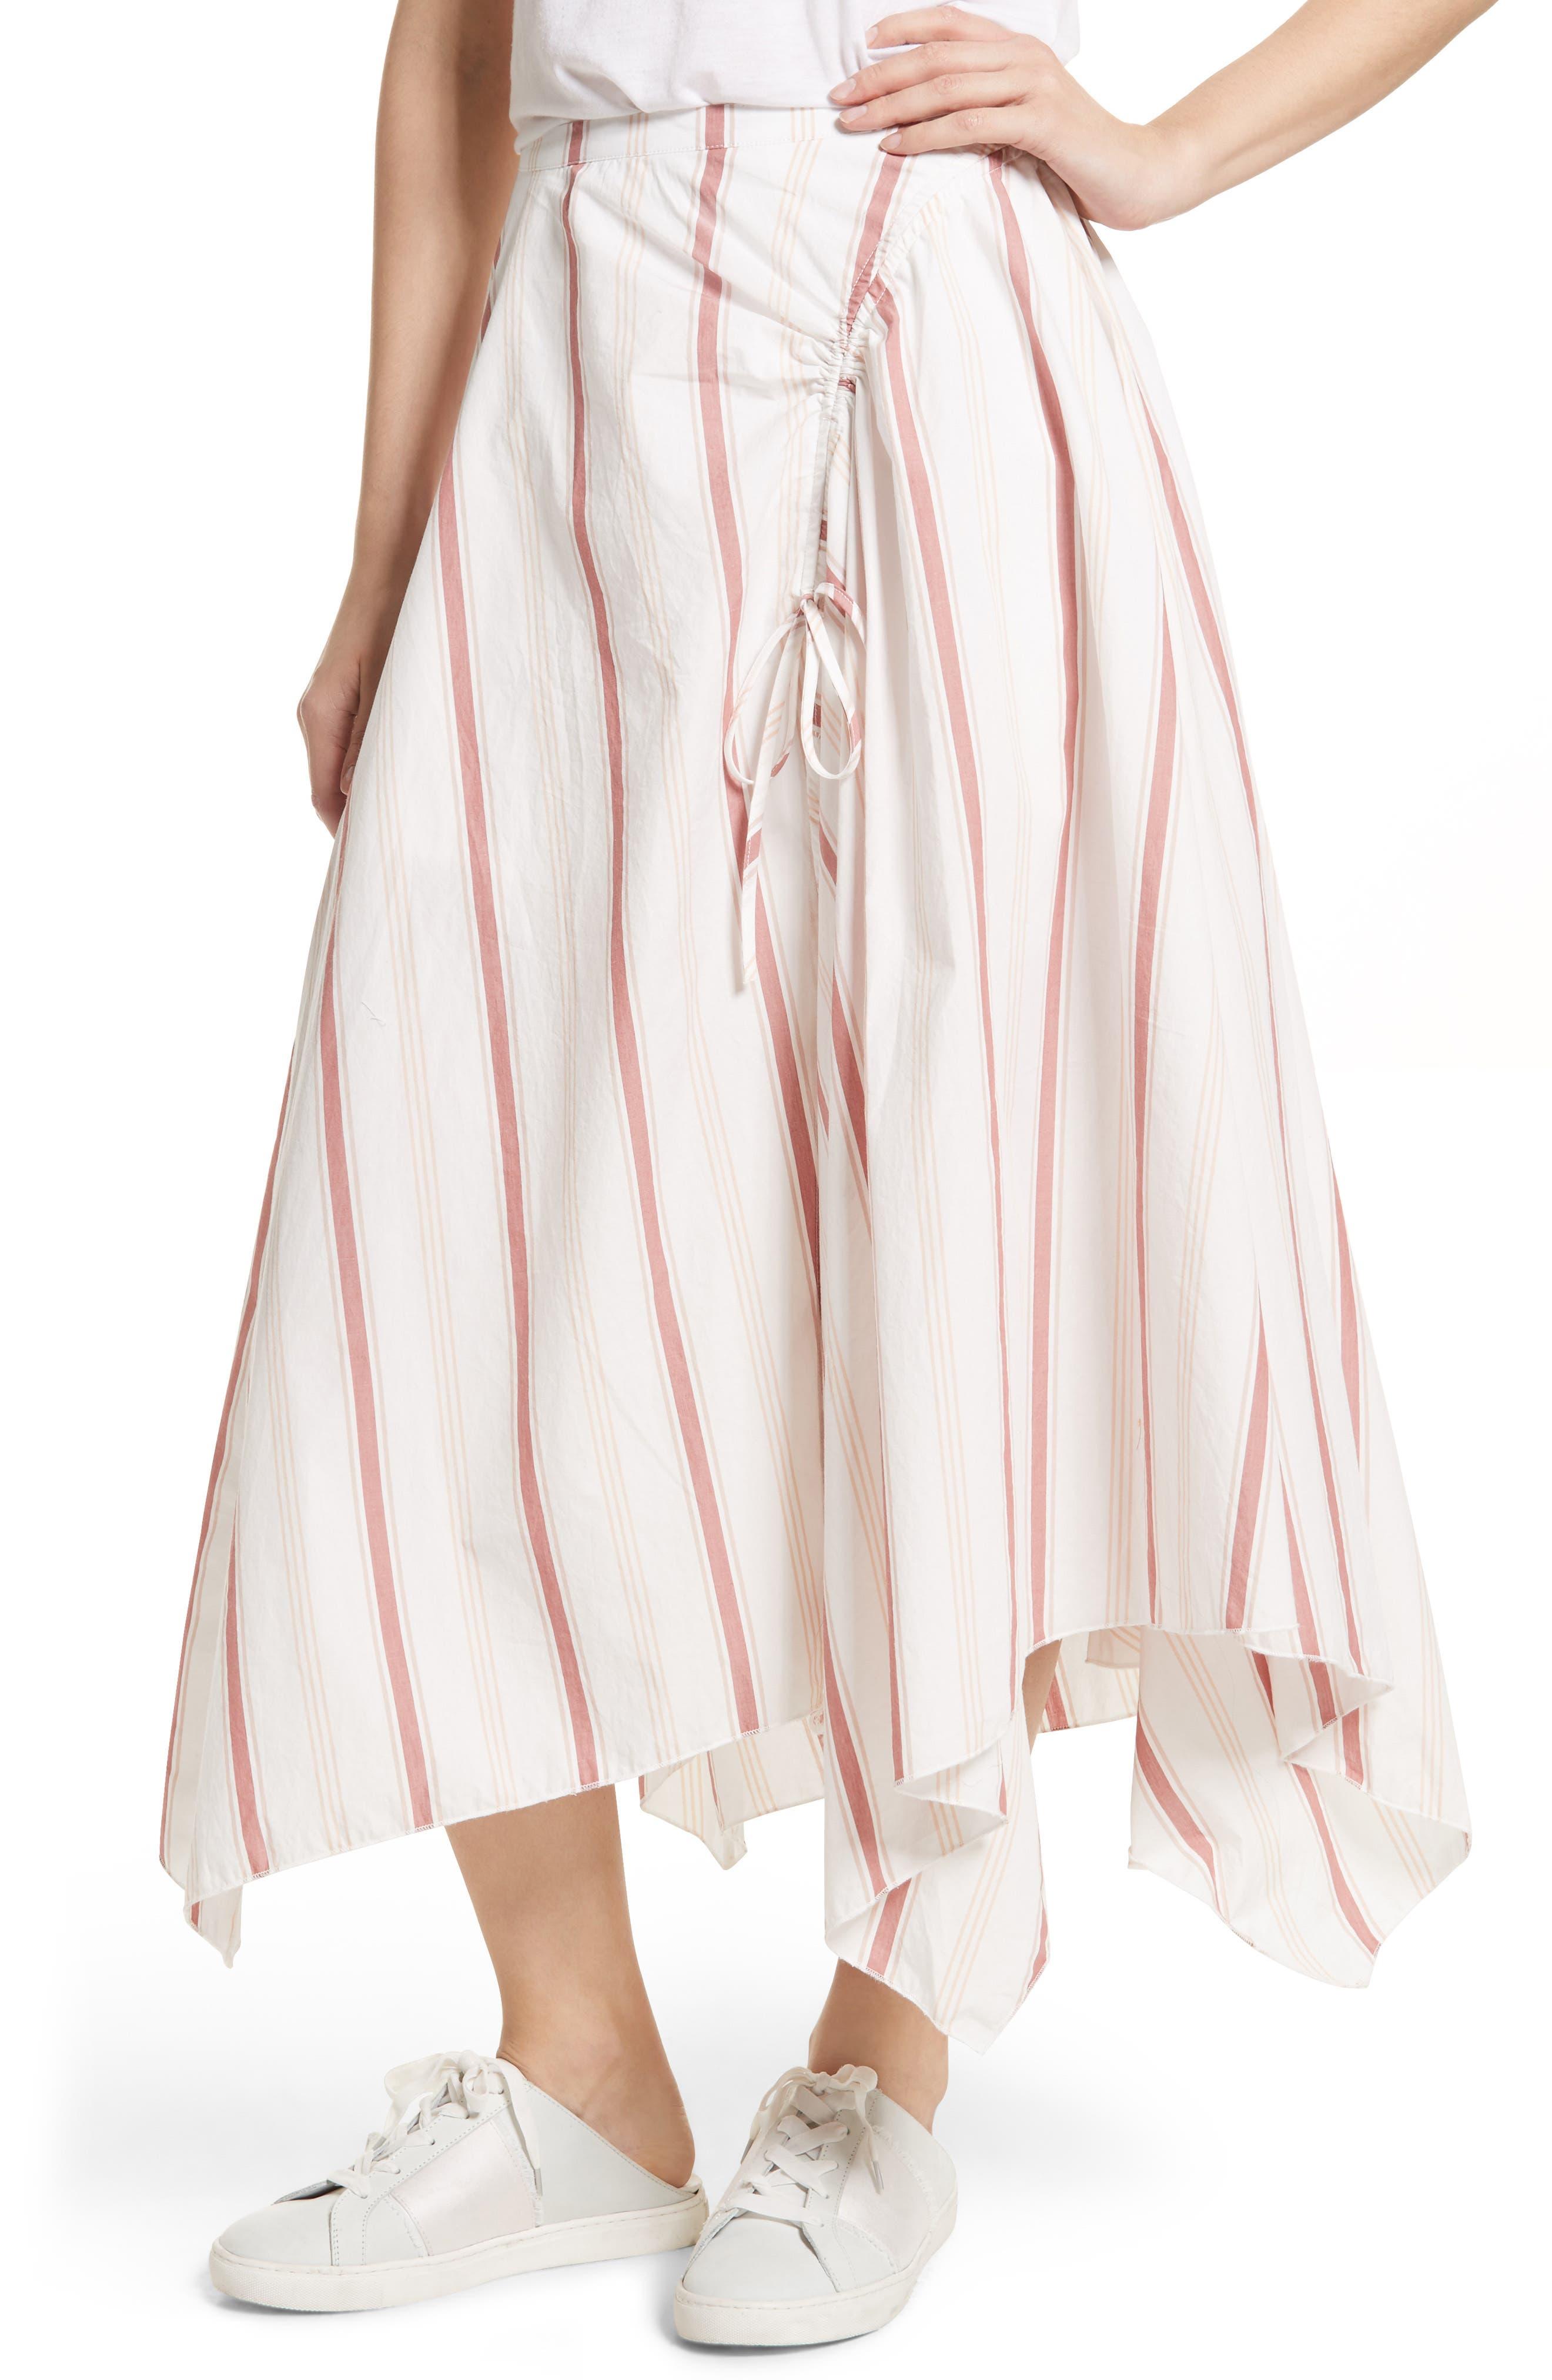 Hooked on Your Love Midi Skirt,                             Alternate thumbnail 4, color,                             903